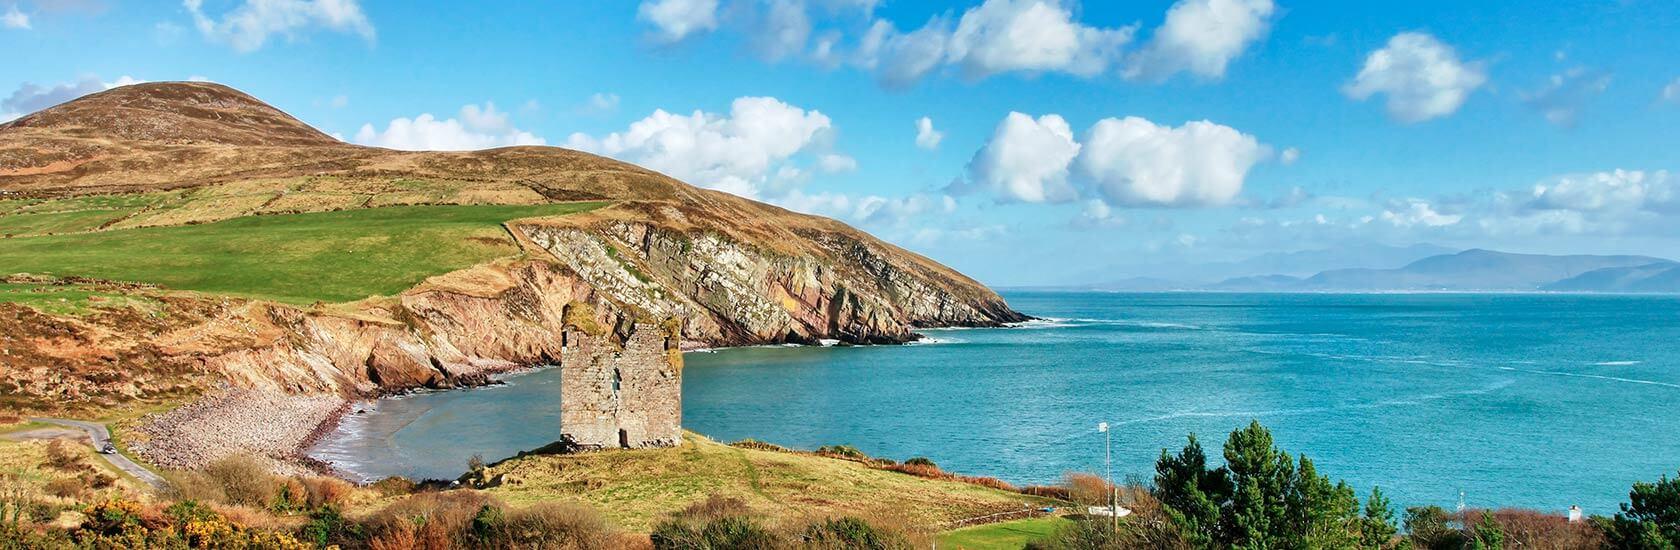 Multi-day tours of Ireland